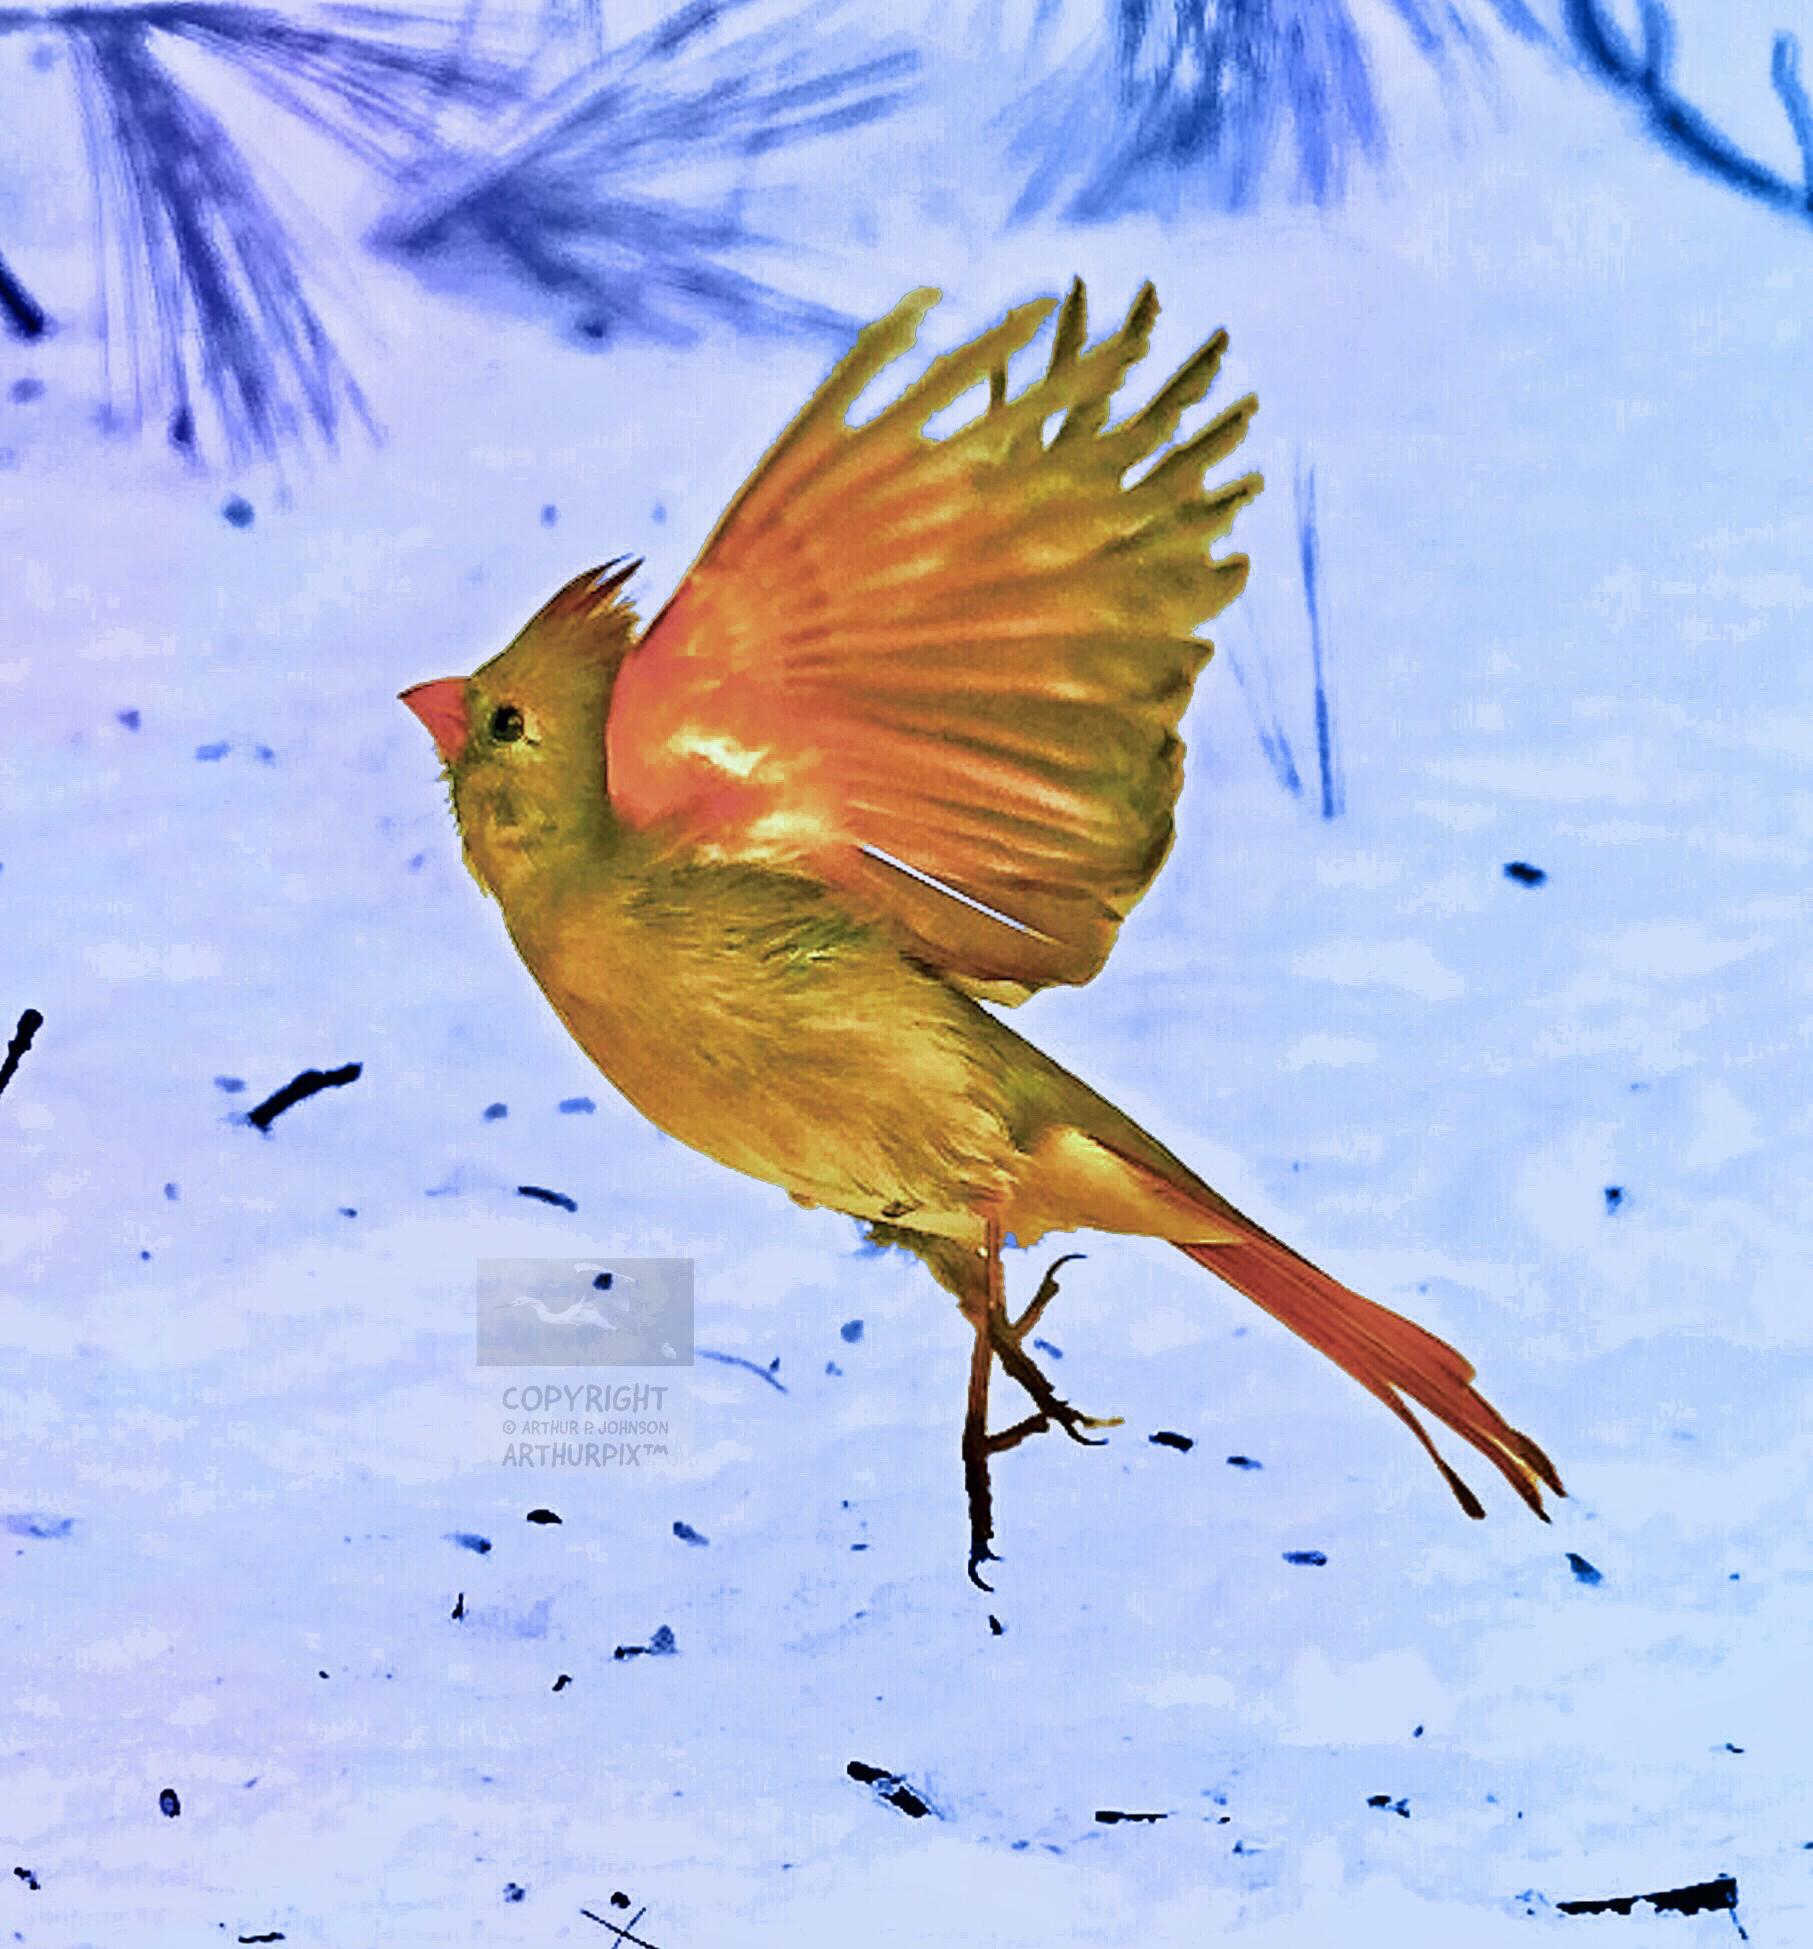 Female Cardinal in flight over field of snow